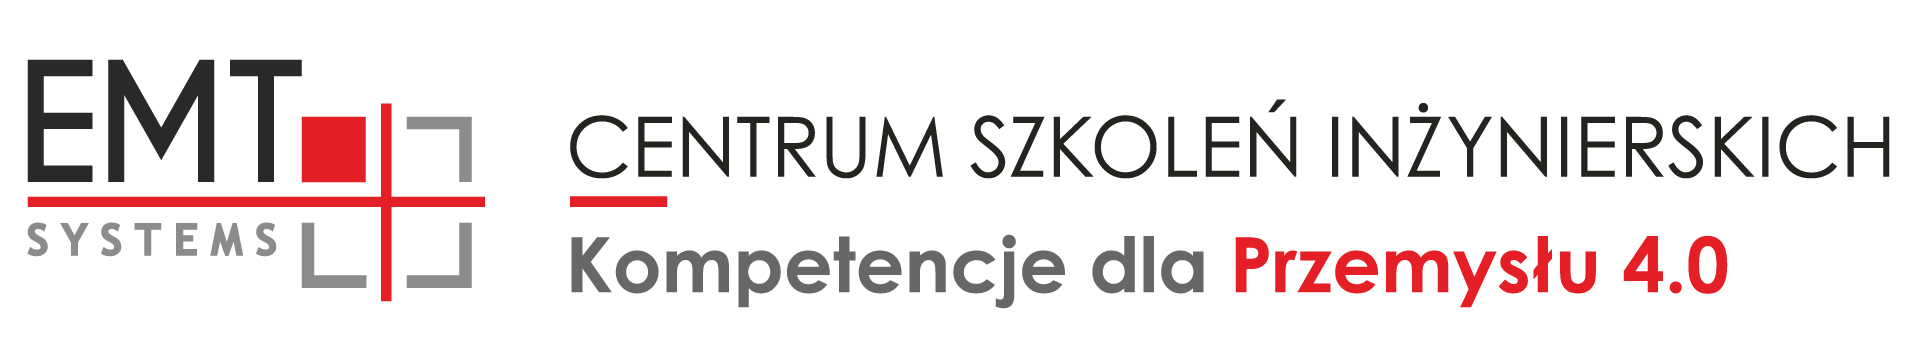 LOGOEMT Systems cmyk z kompetencjami 1